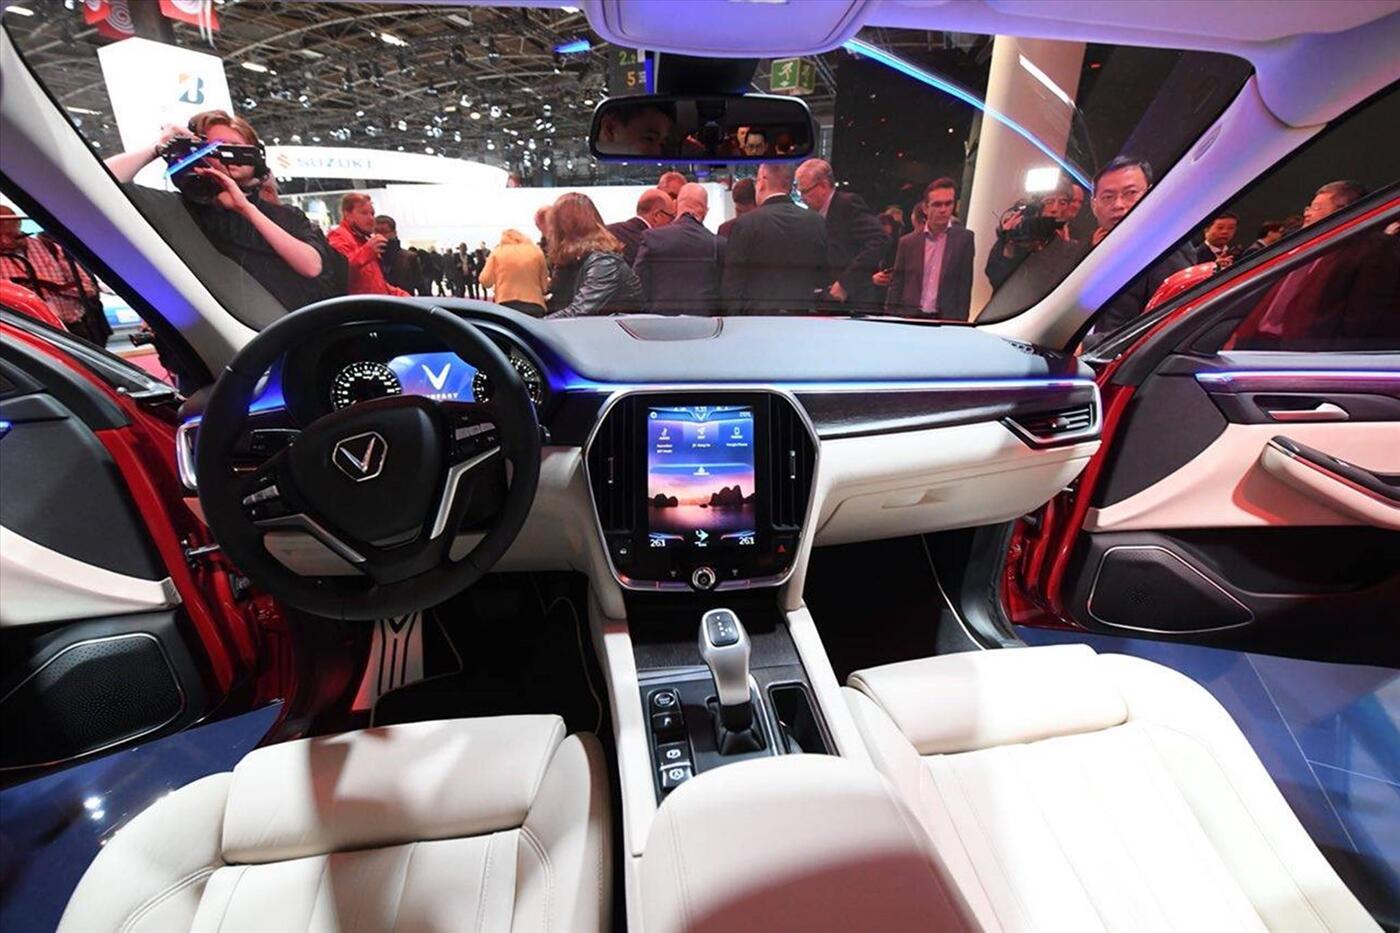 Ảnh VinFast LUX SA 2.0 tại Paris Motorshow 2018